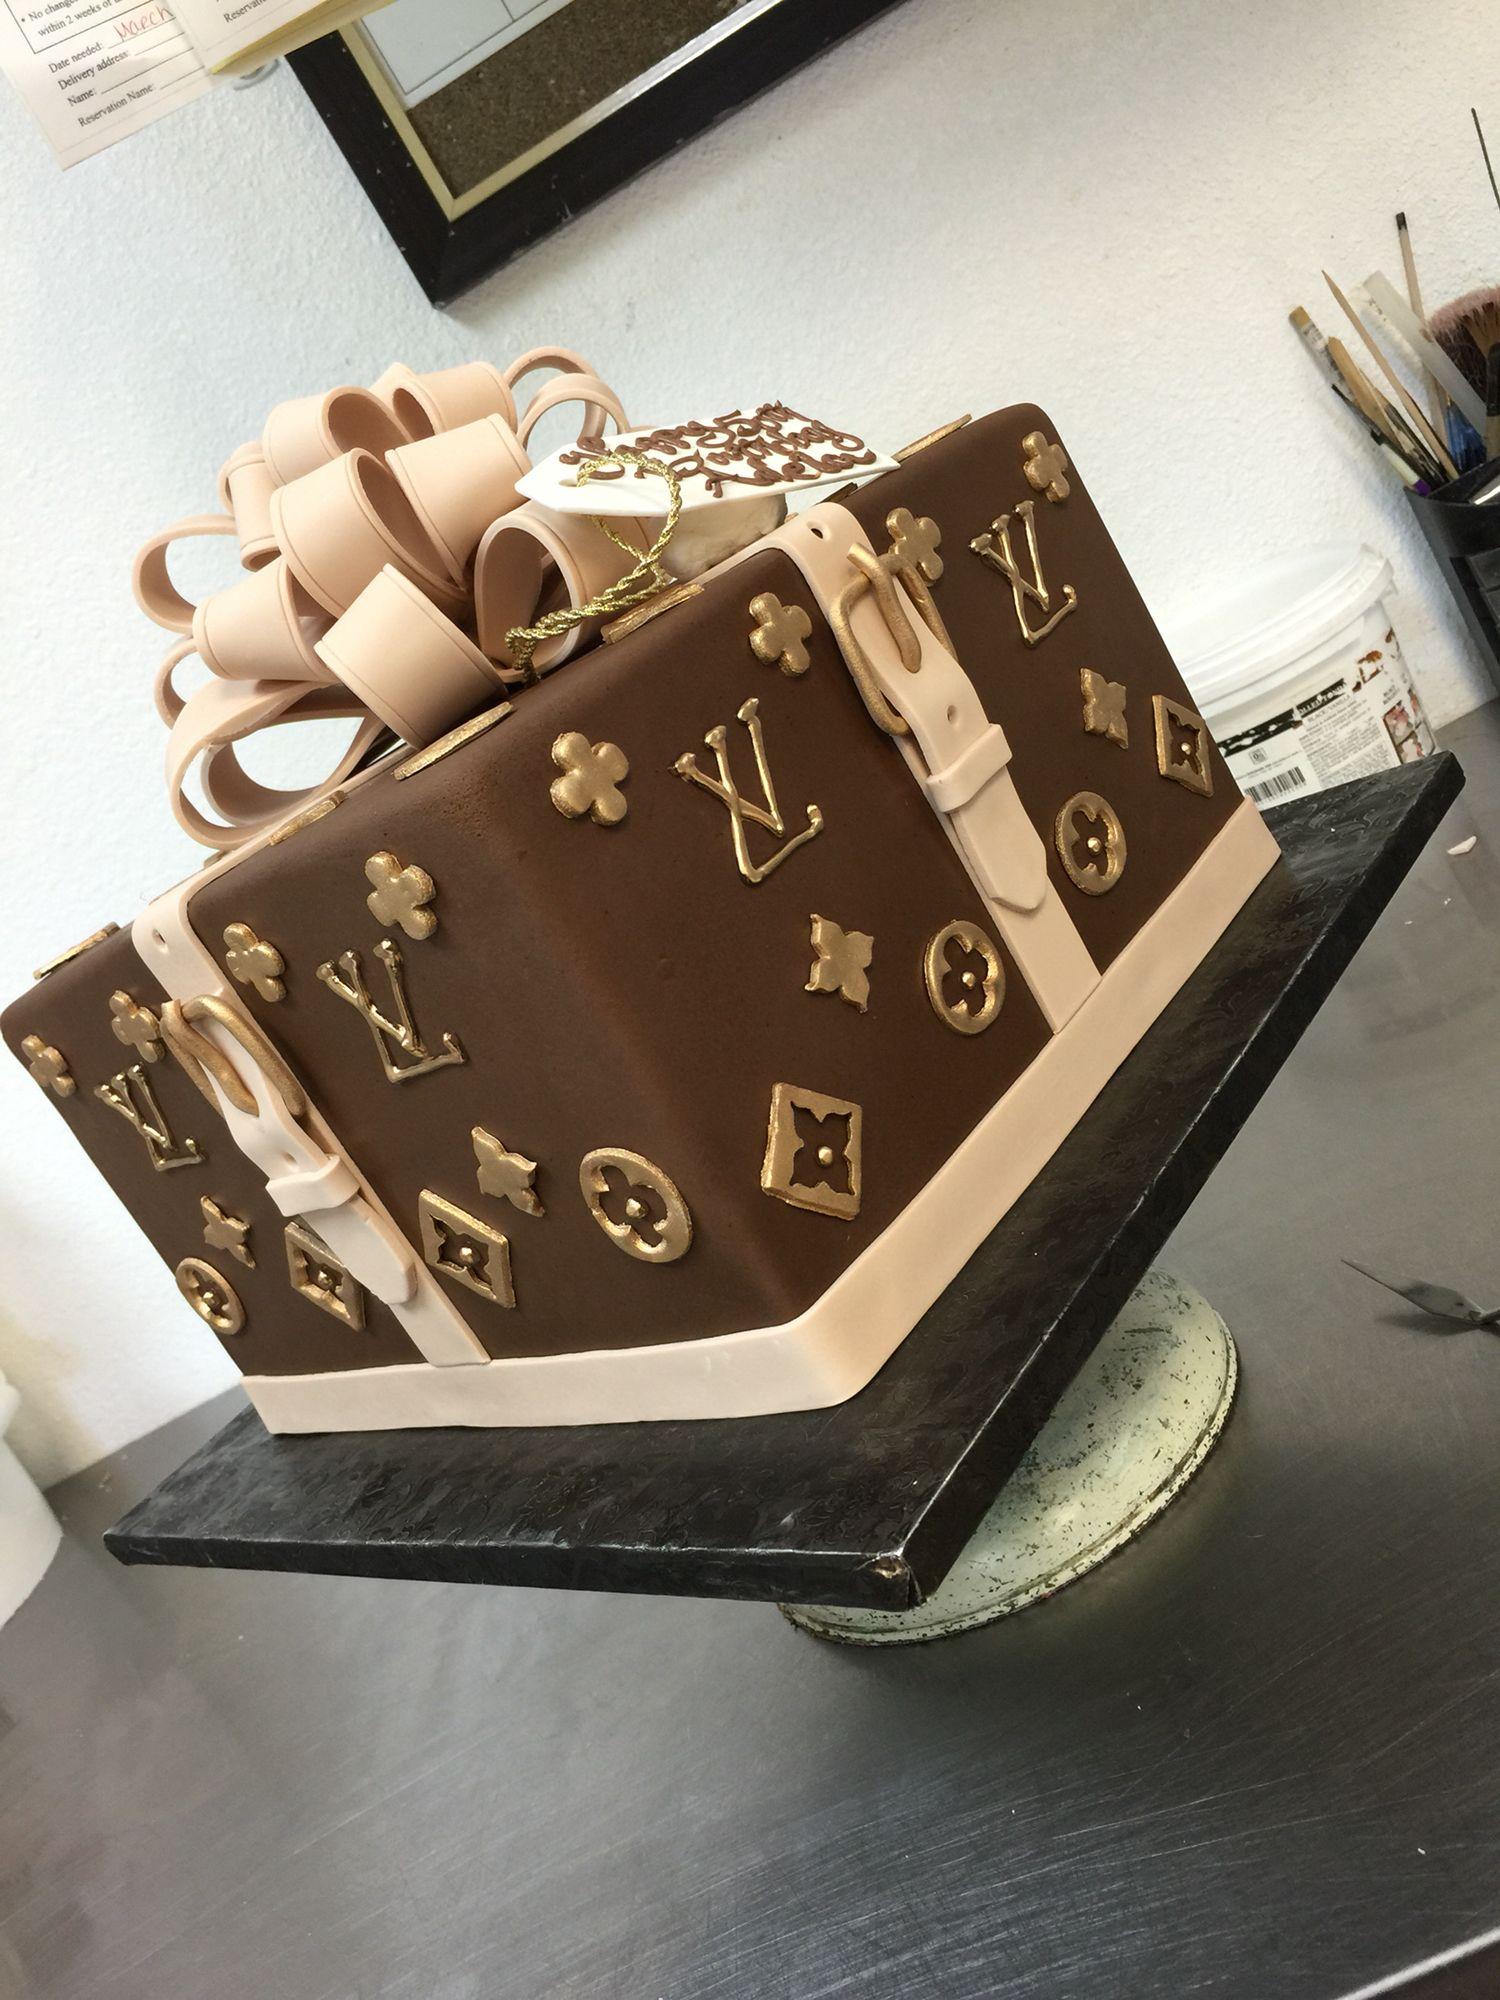 Cake Louis Vuitton Pinterest : Louis Vuitton Cake Creative Sweets ~ Cakes Pinterest ...